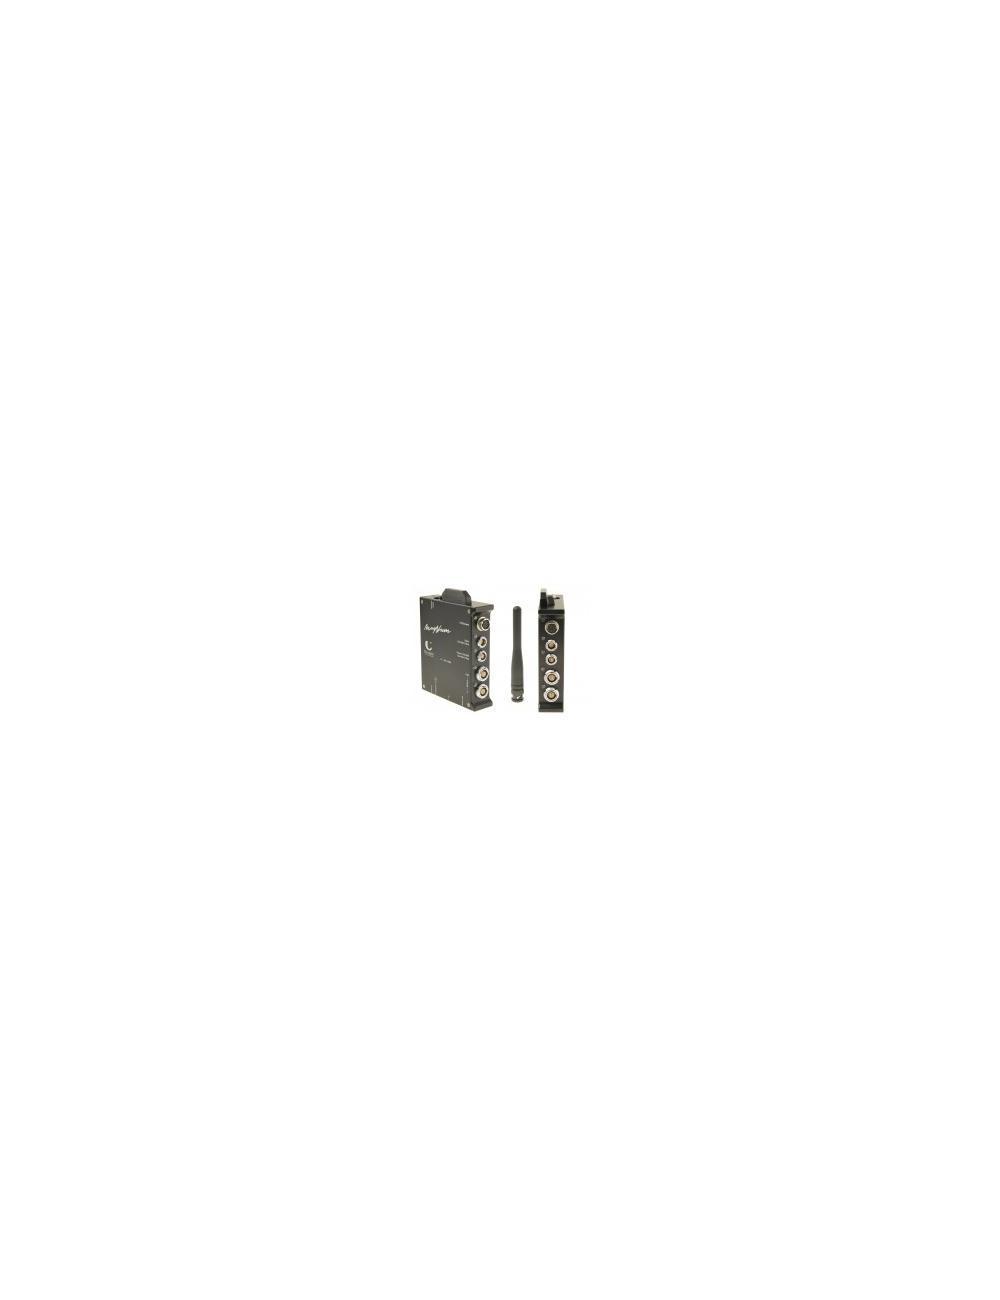 Chrosziel - Receptor Magnum con antena